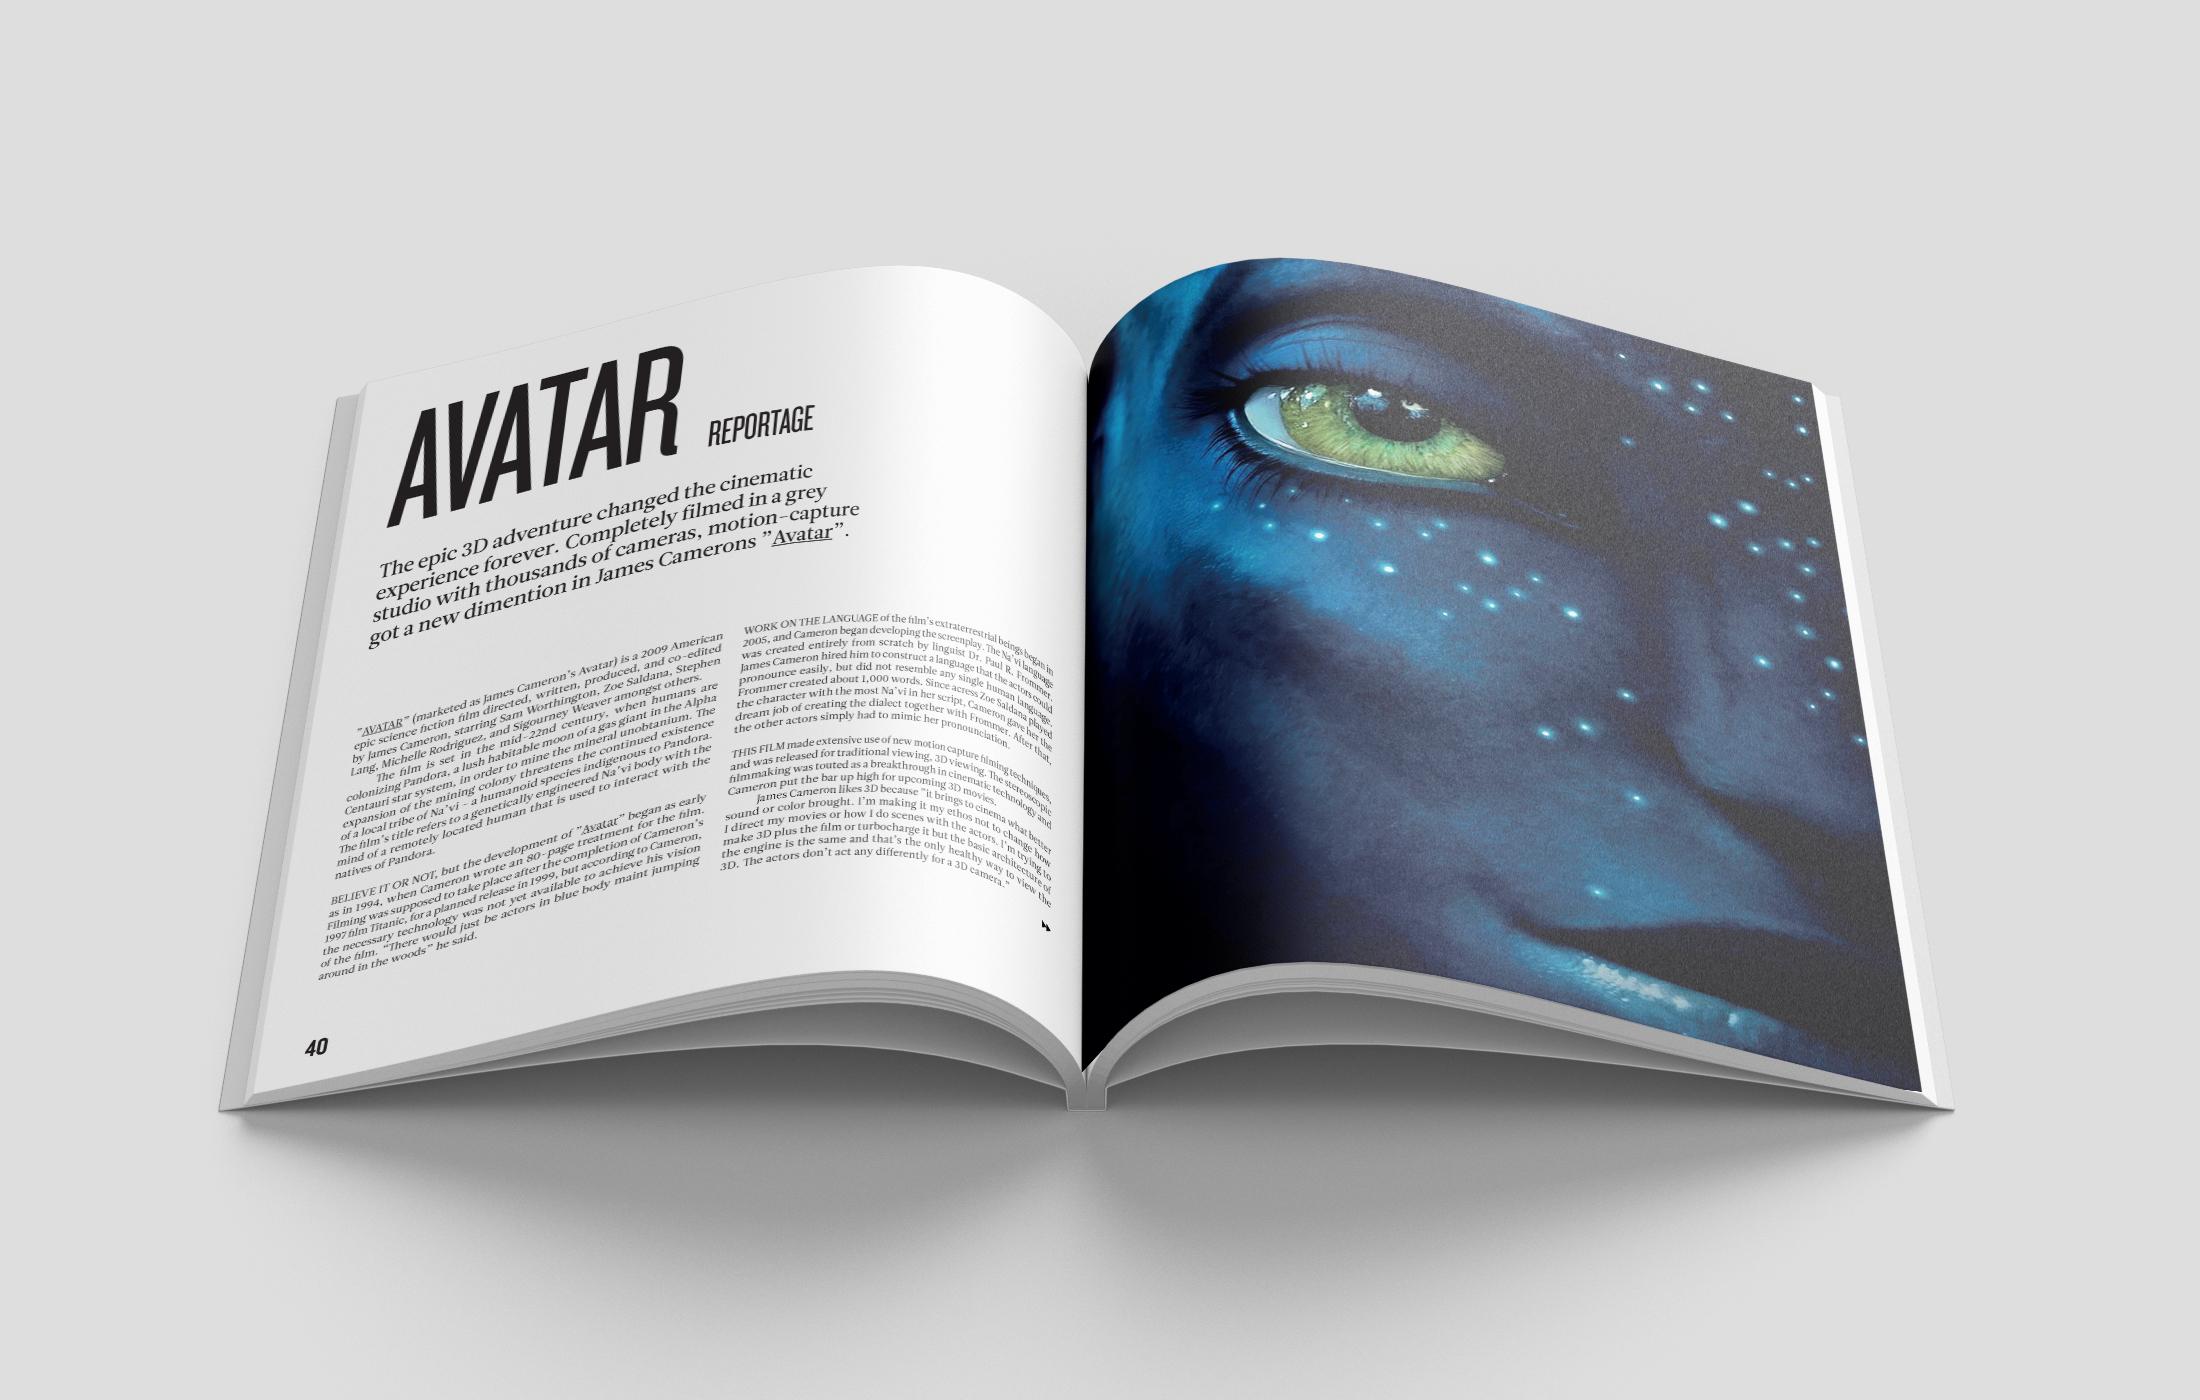 Avatar_BTS_LisaLiljenberg_CilantroStudios.jpg